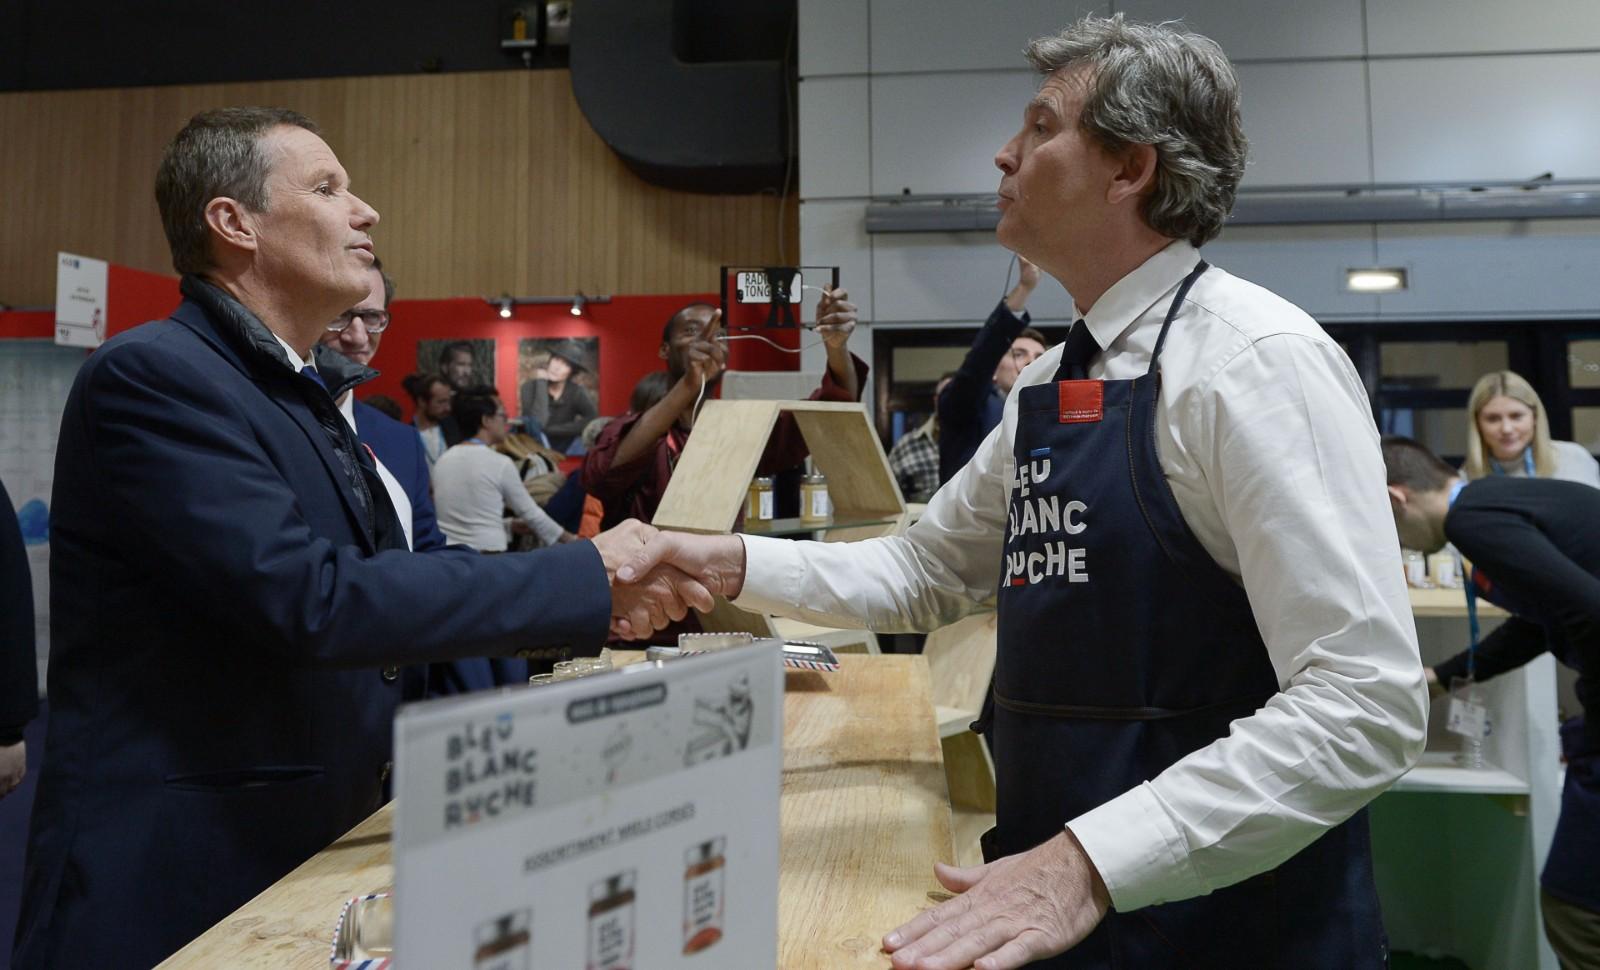 Nicolas Dupont Aignan salue Arnaud Montebourg au Salon du Made in France, novembre 2019 © ISA HARSIN/SIPA Numéro de reportage: 00931491_000003